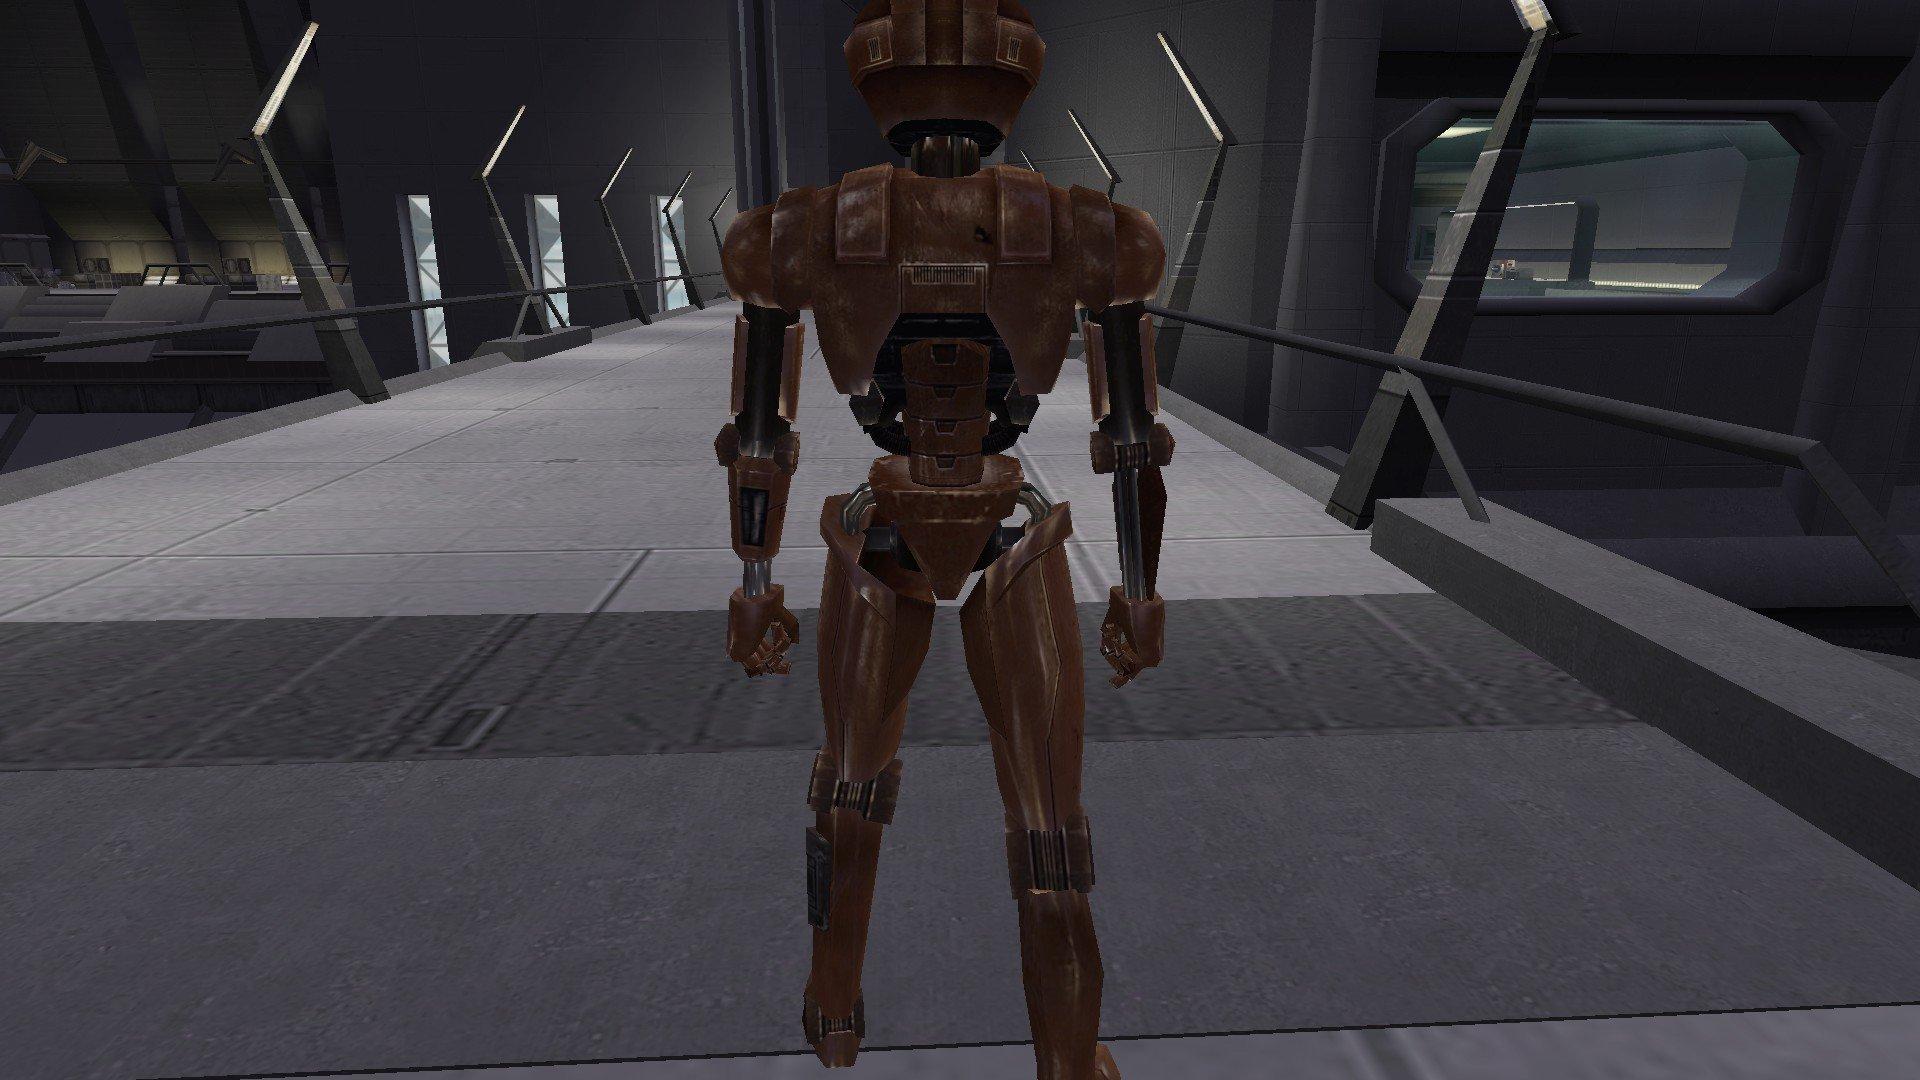 HereSpartan's HK Skins V2